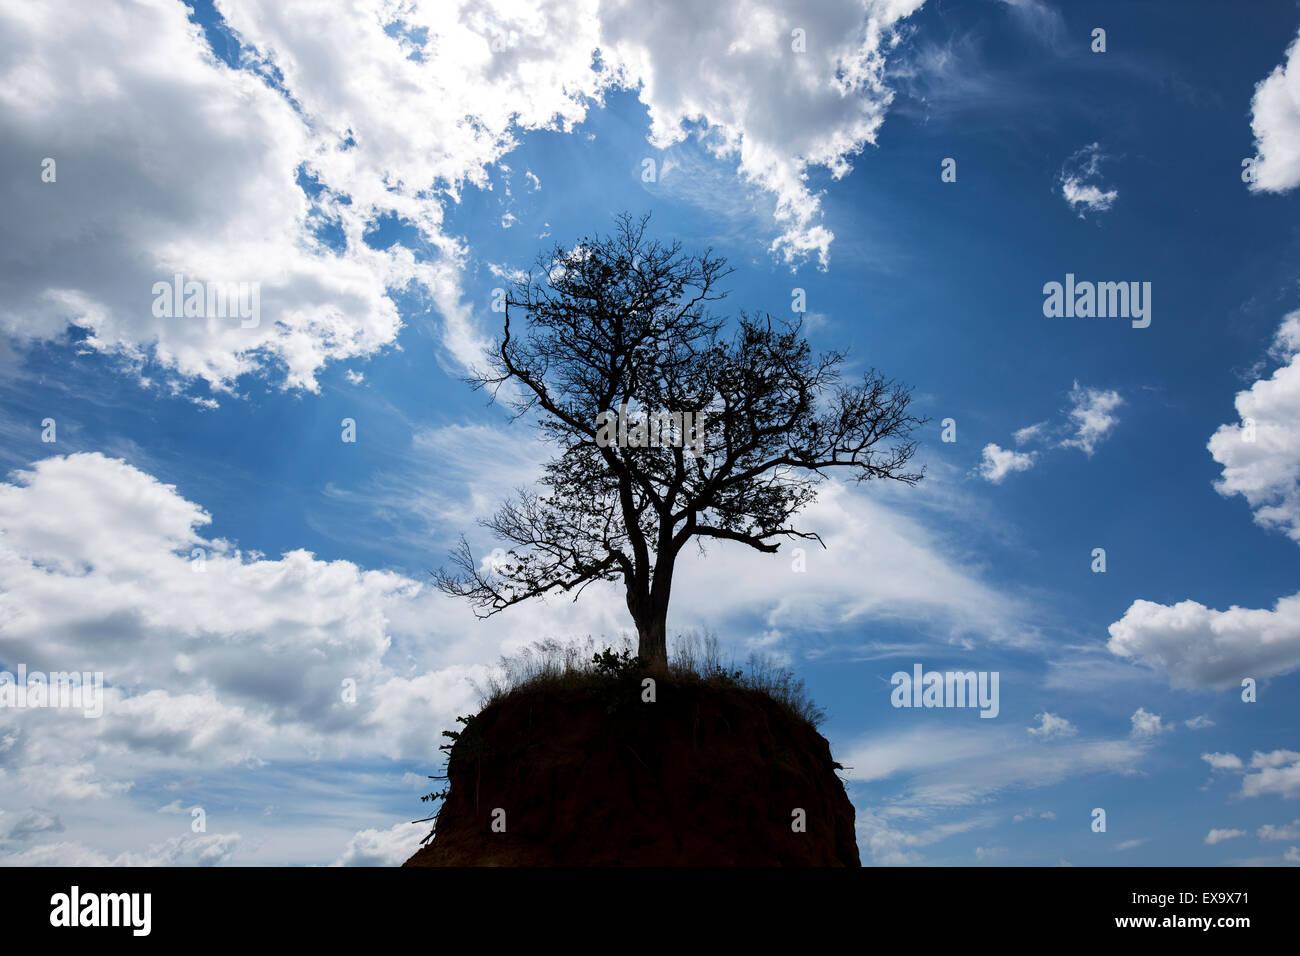 Africa, Botswana, Lone tree on eroded hilltop in Kalahari Desert - Stock Image